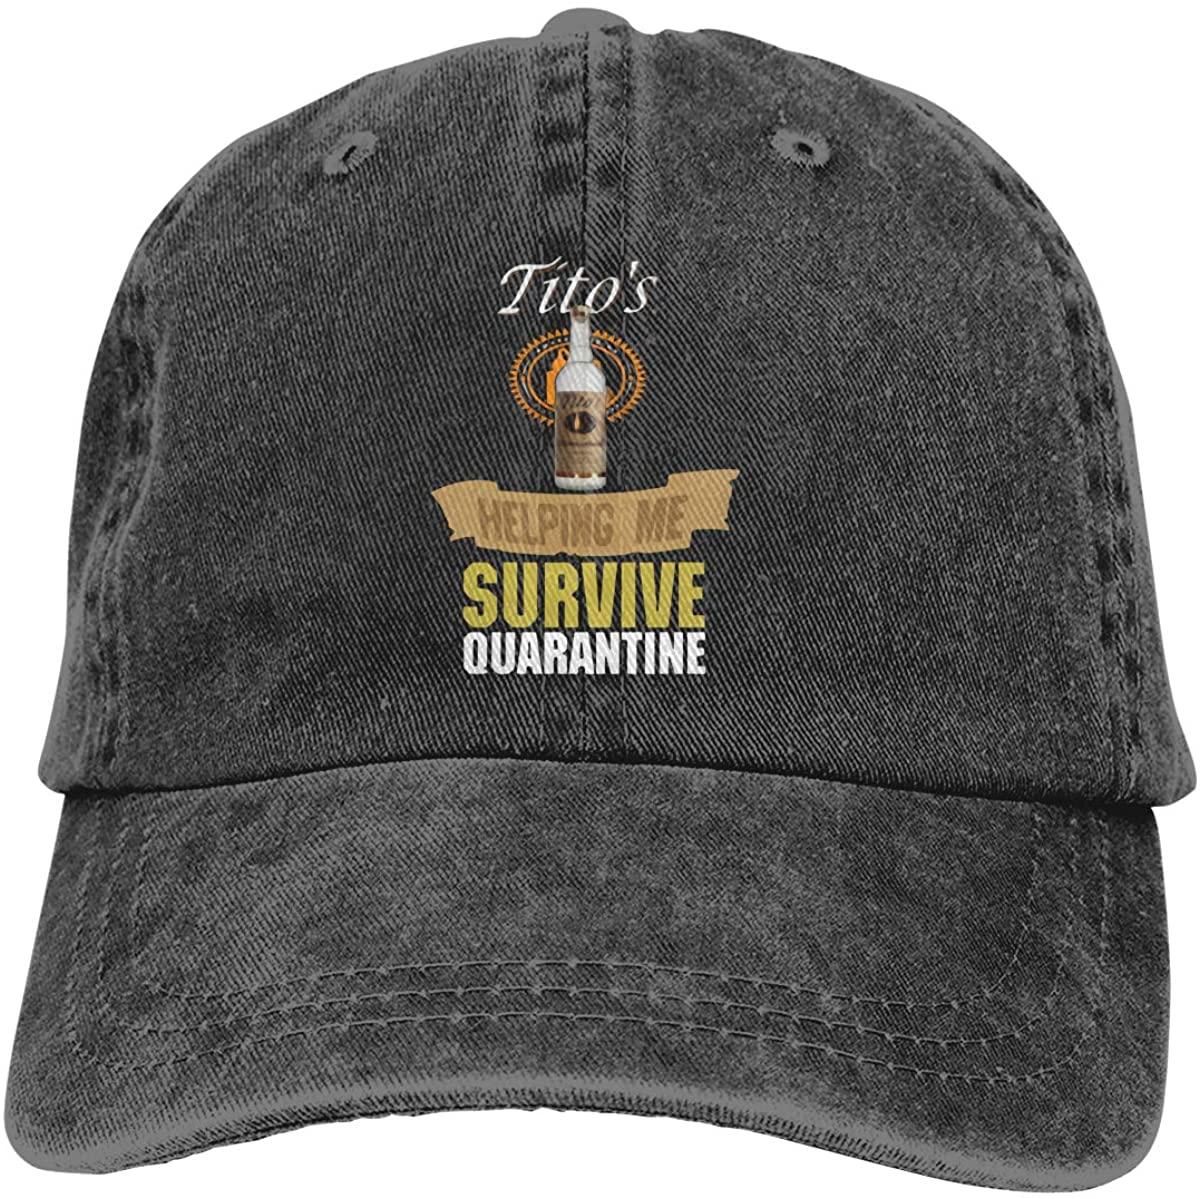 Kelo Tito'S Vodka Adjustable Unisex Hat Baseball Caps Black